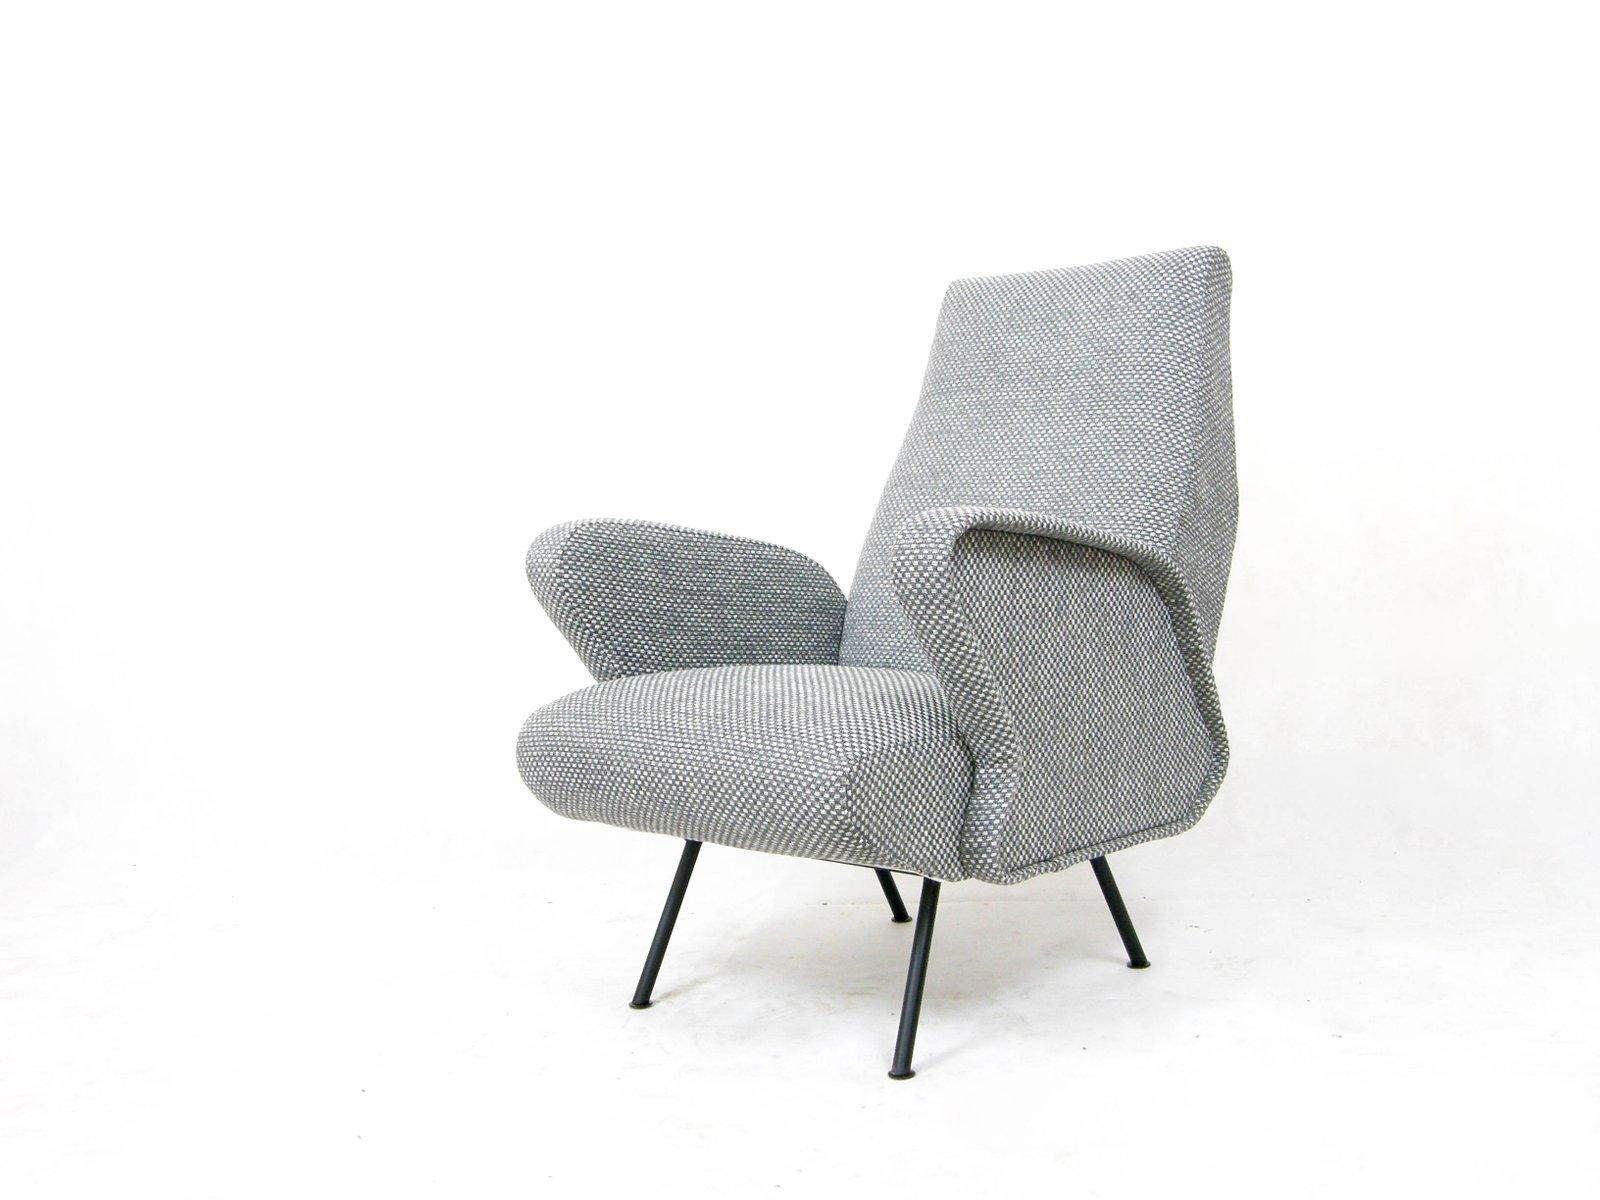 Italienischer Grauer Sessel, 1950er